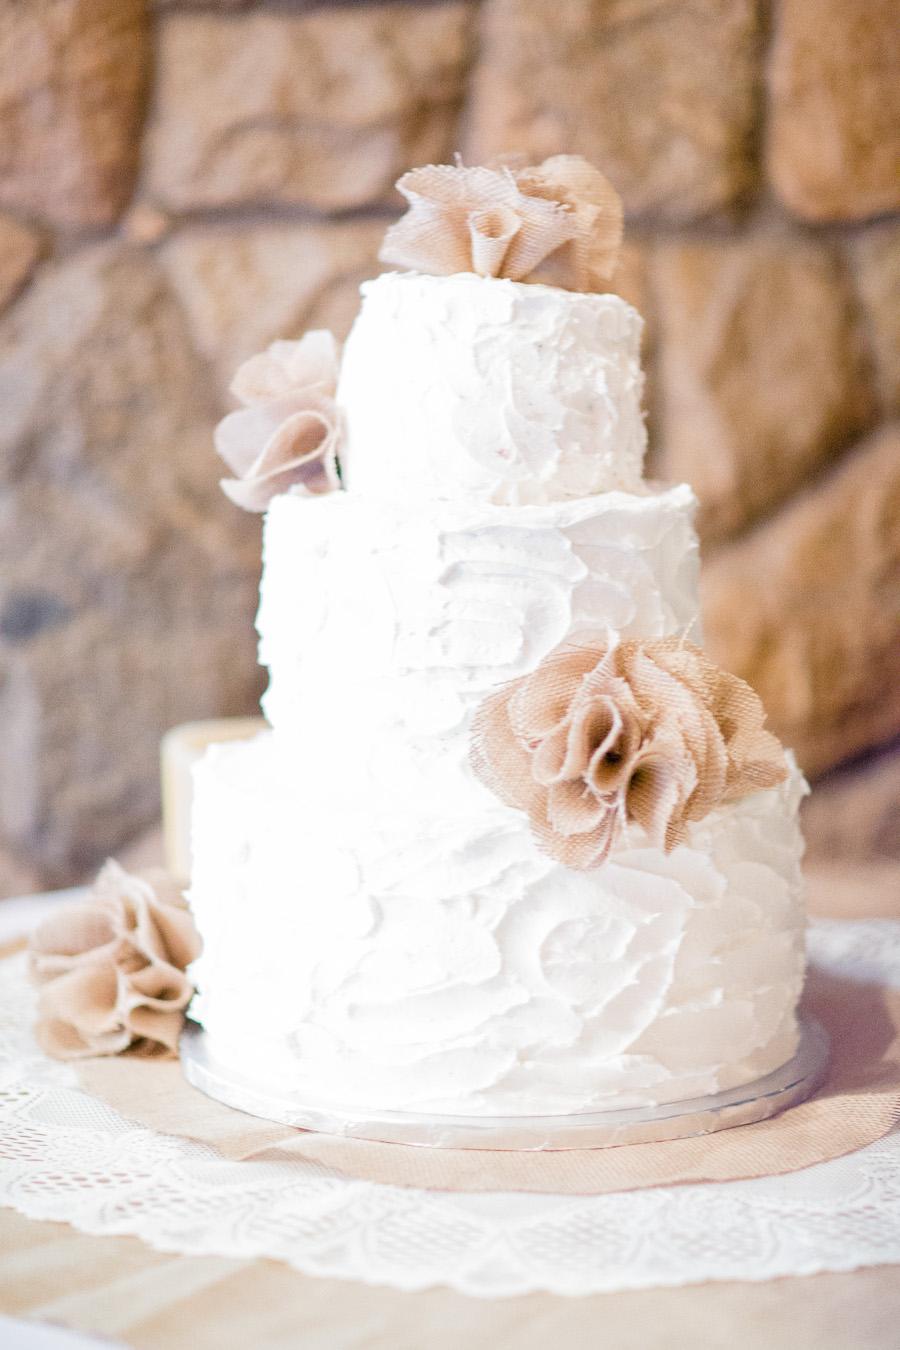 fine art wedding photography, burlap rose wedding cake, fine art wedding portraiture, soft light